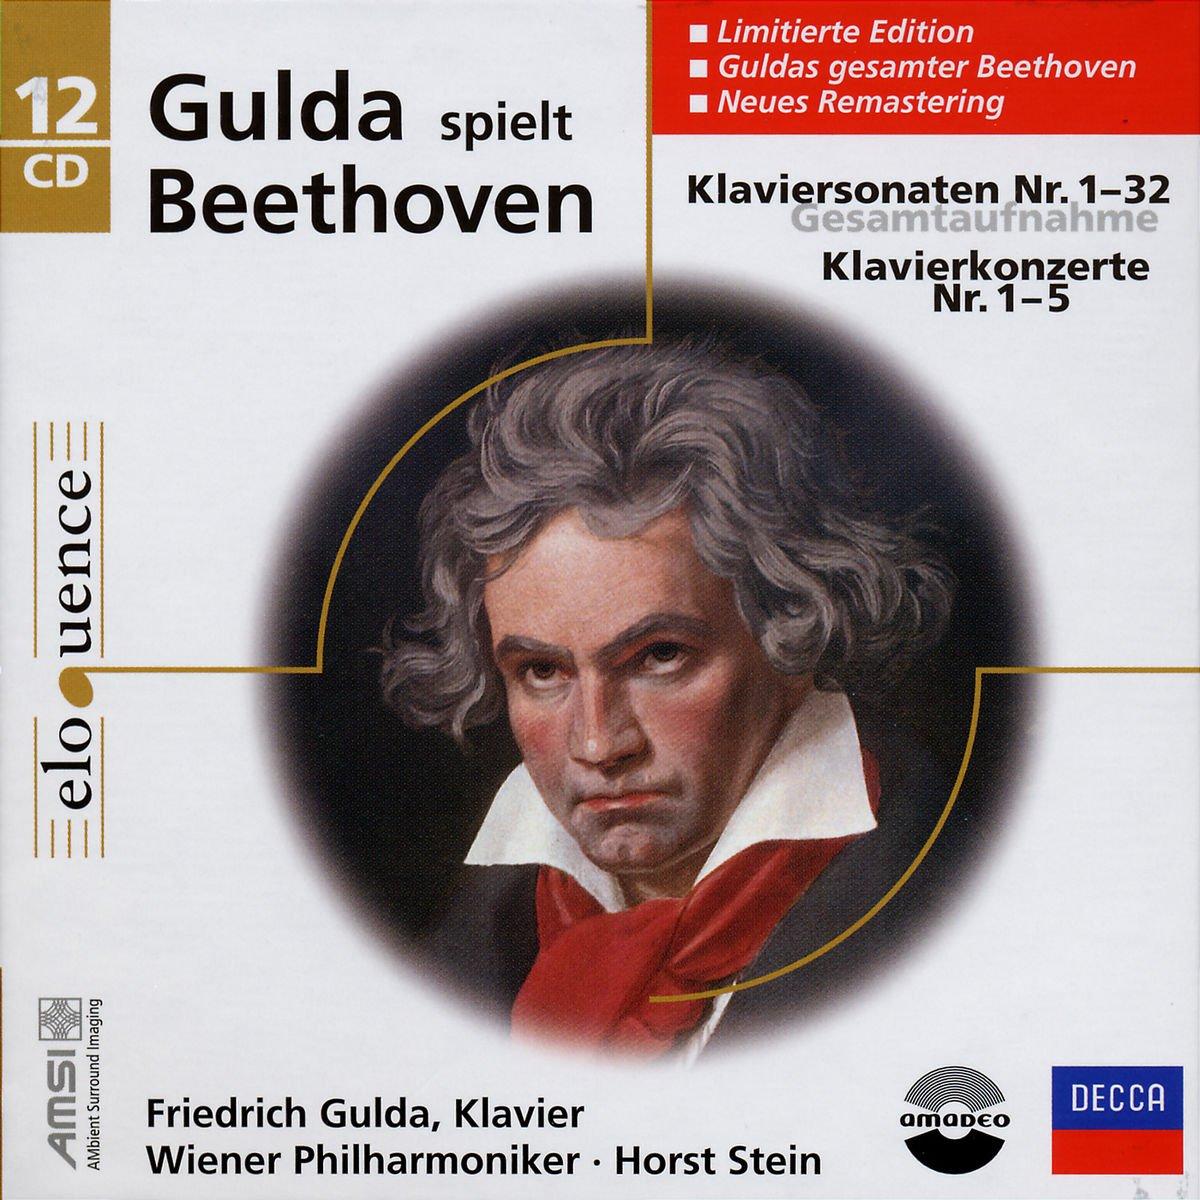 Friedrich  Gulda du jazz à la java classique 71yNzNKeSHL